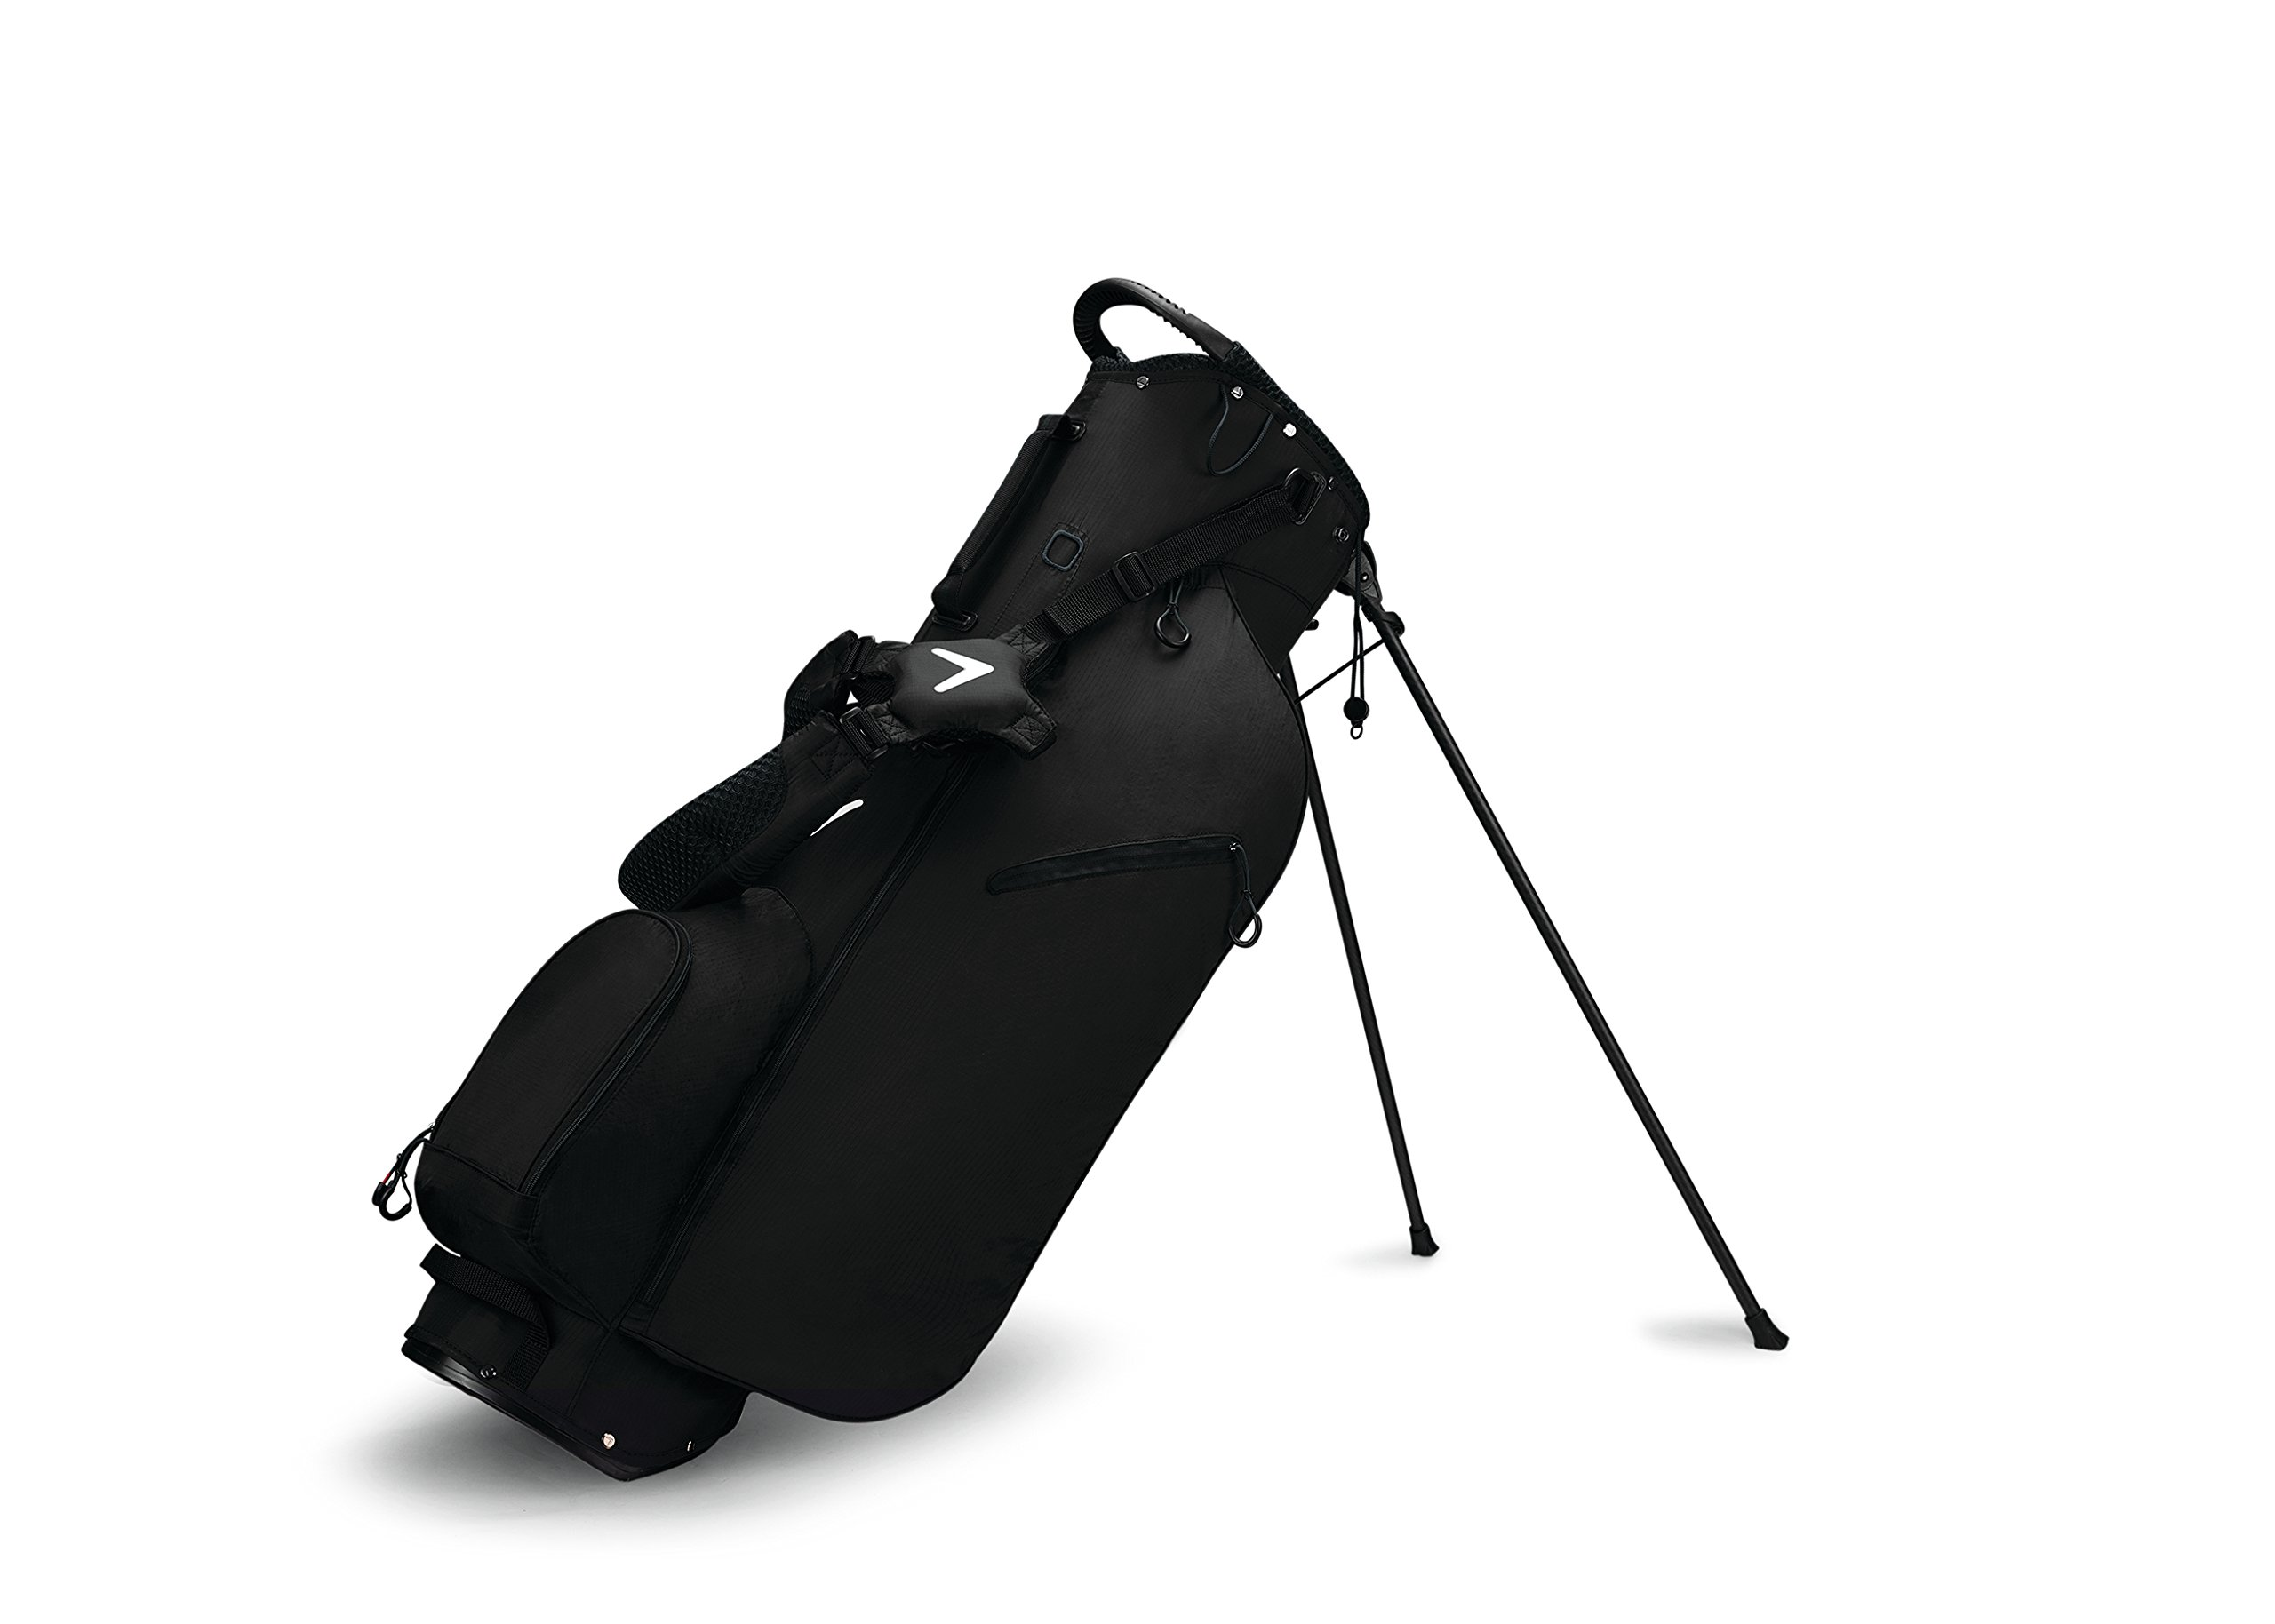 Callaway Hyper Lite Zero Golf Bags, Black by Callaway (Image #1)